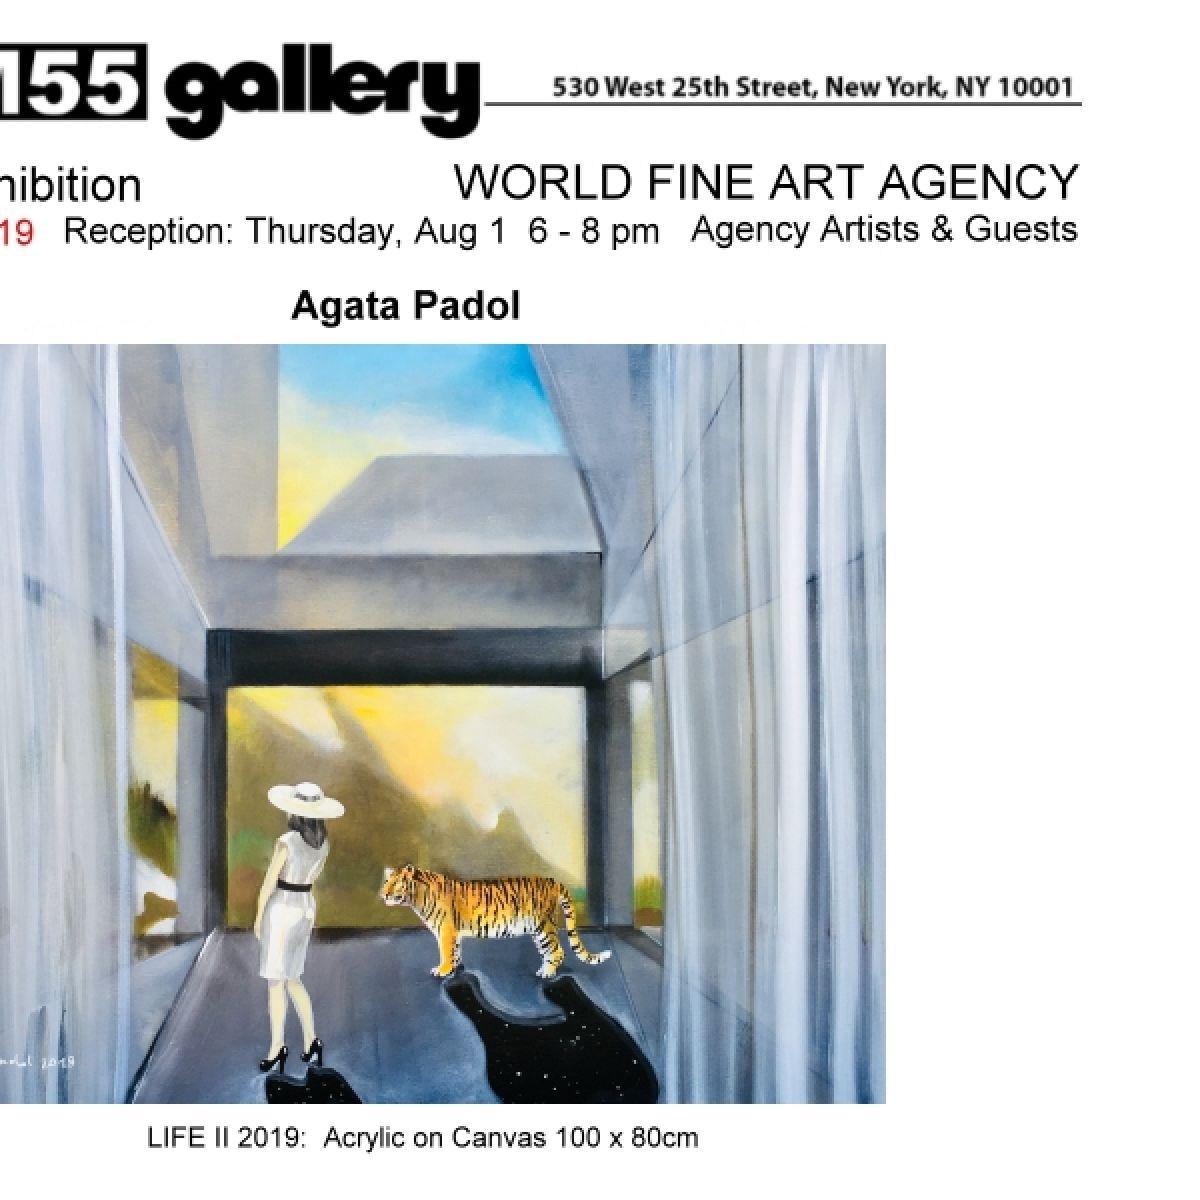 5th Annual Exhibition